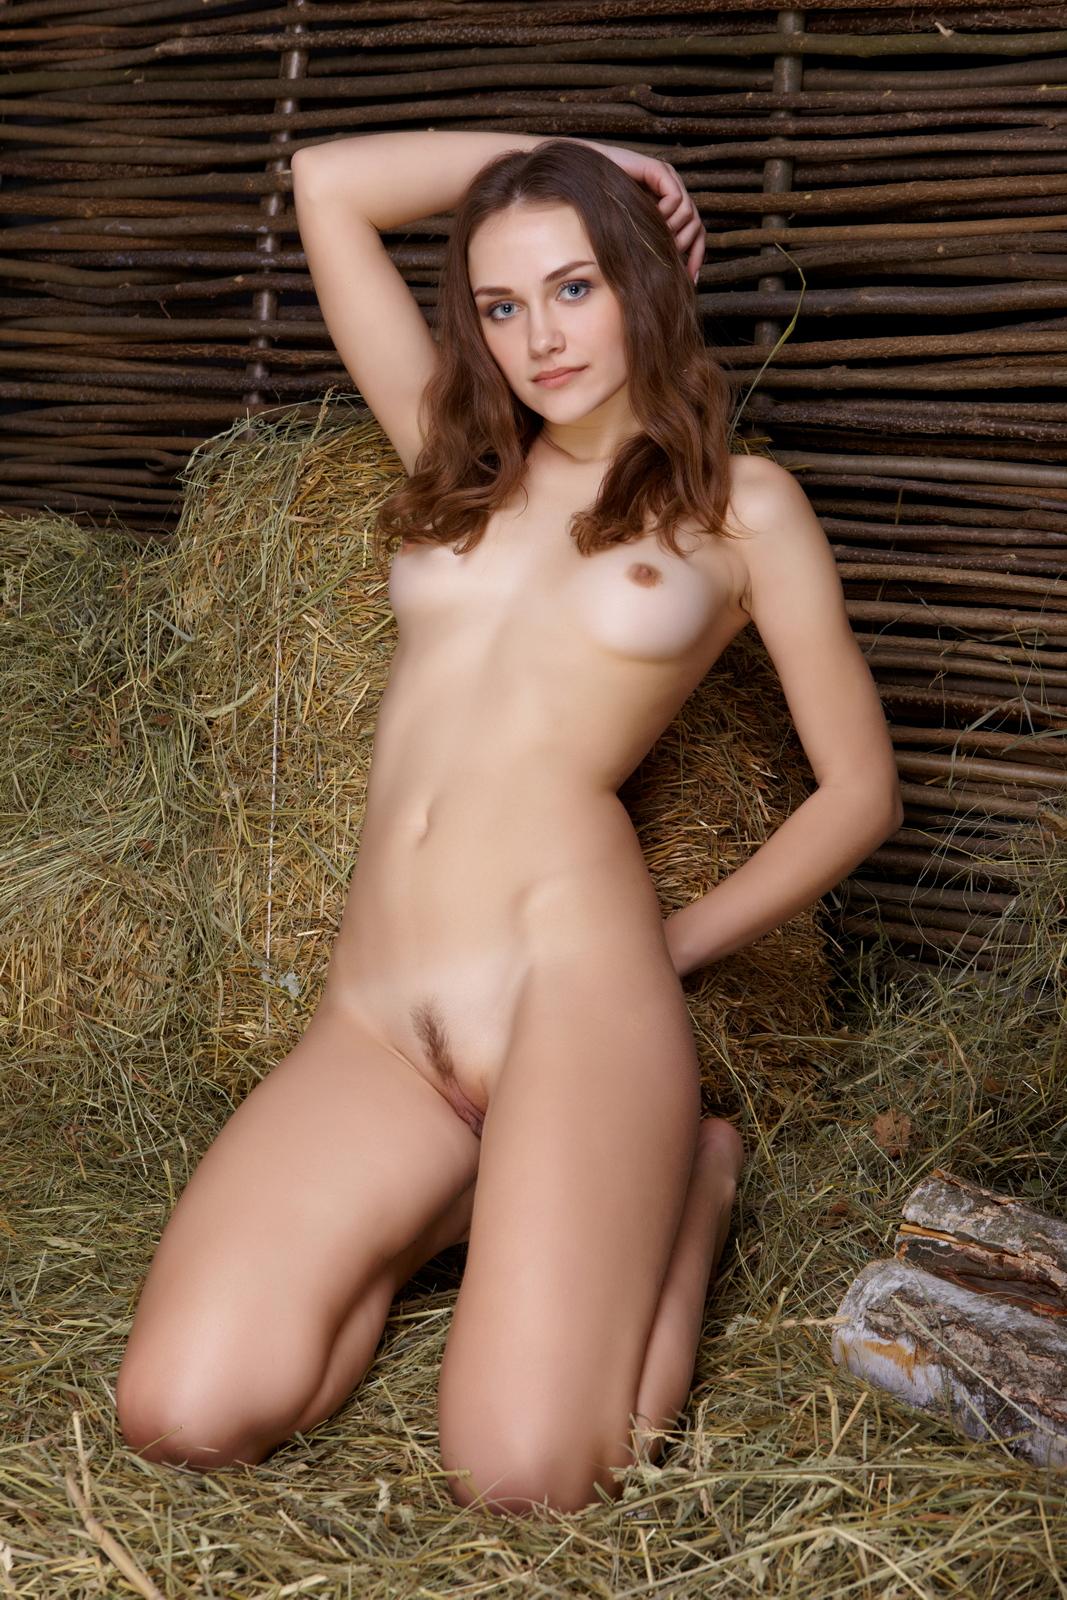 zlatka-a-nude-on-hay-barn-pussy-metart-35